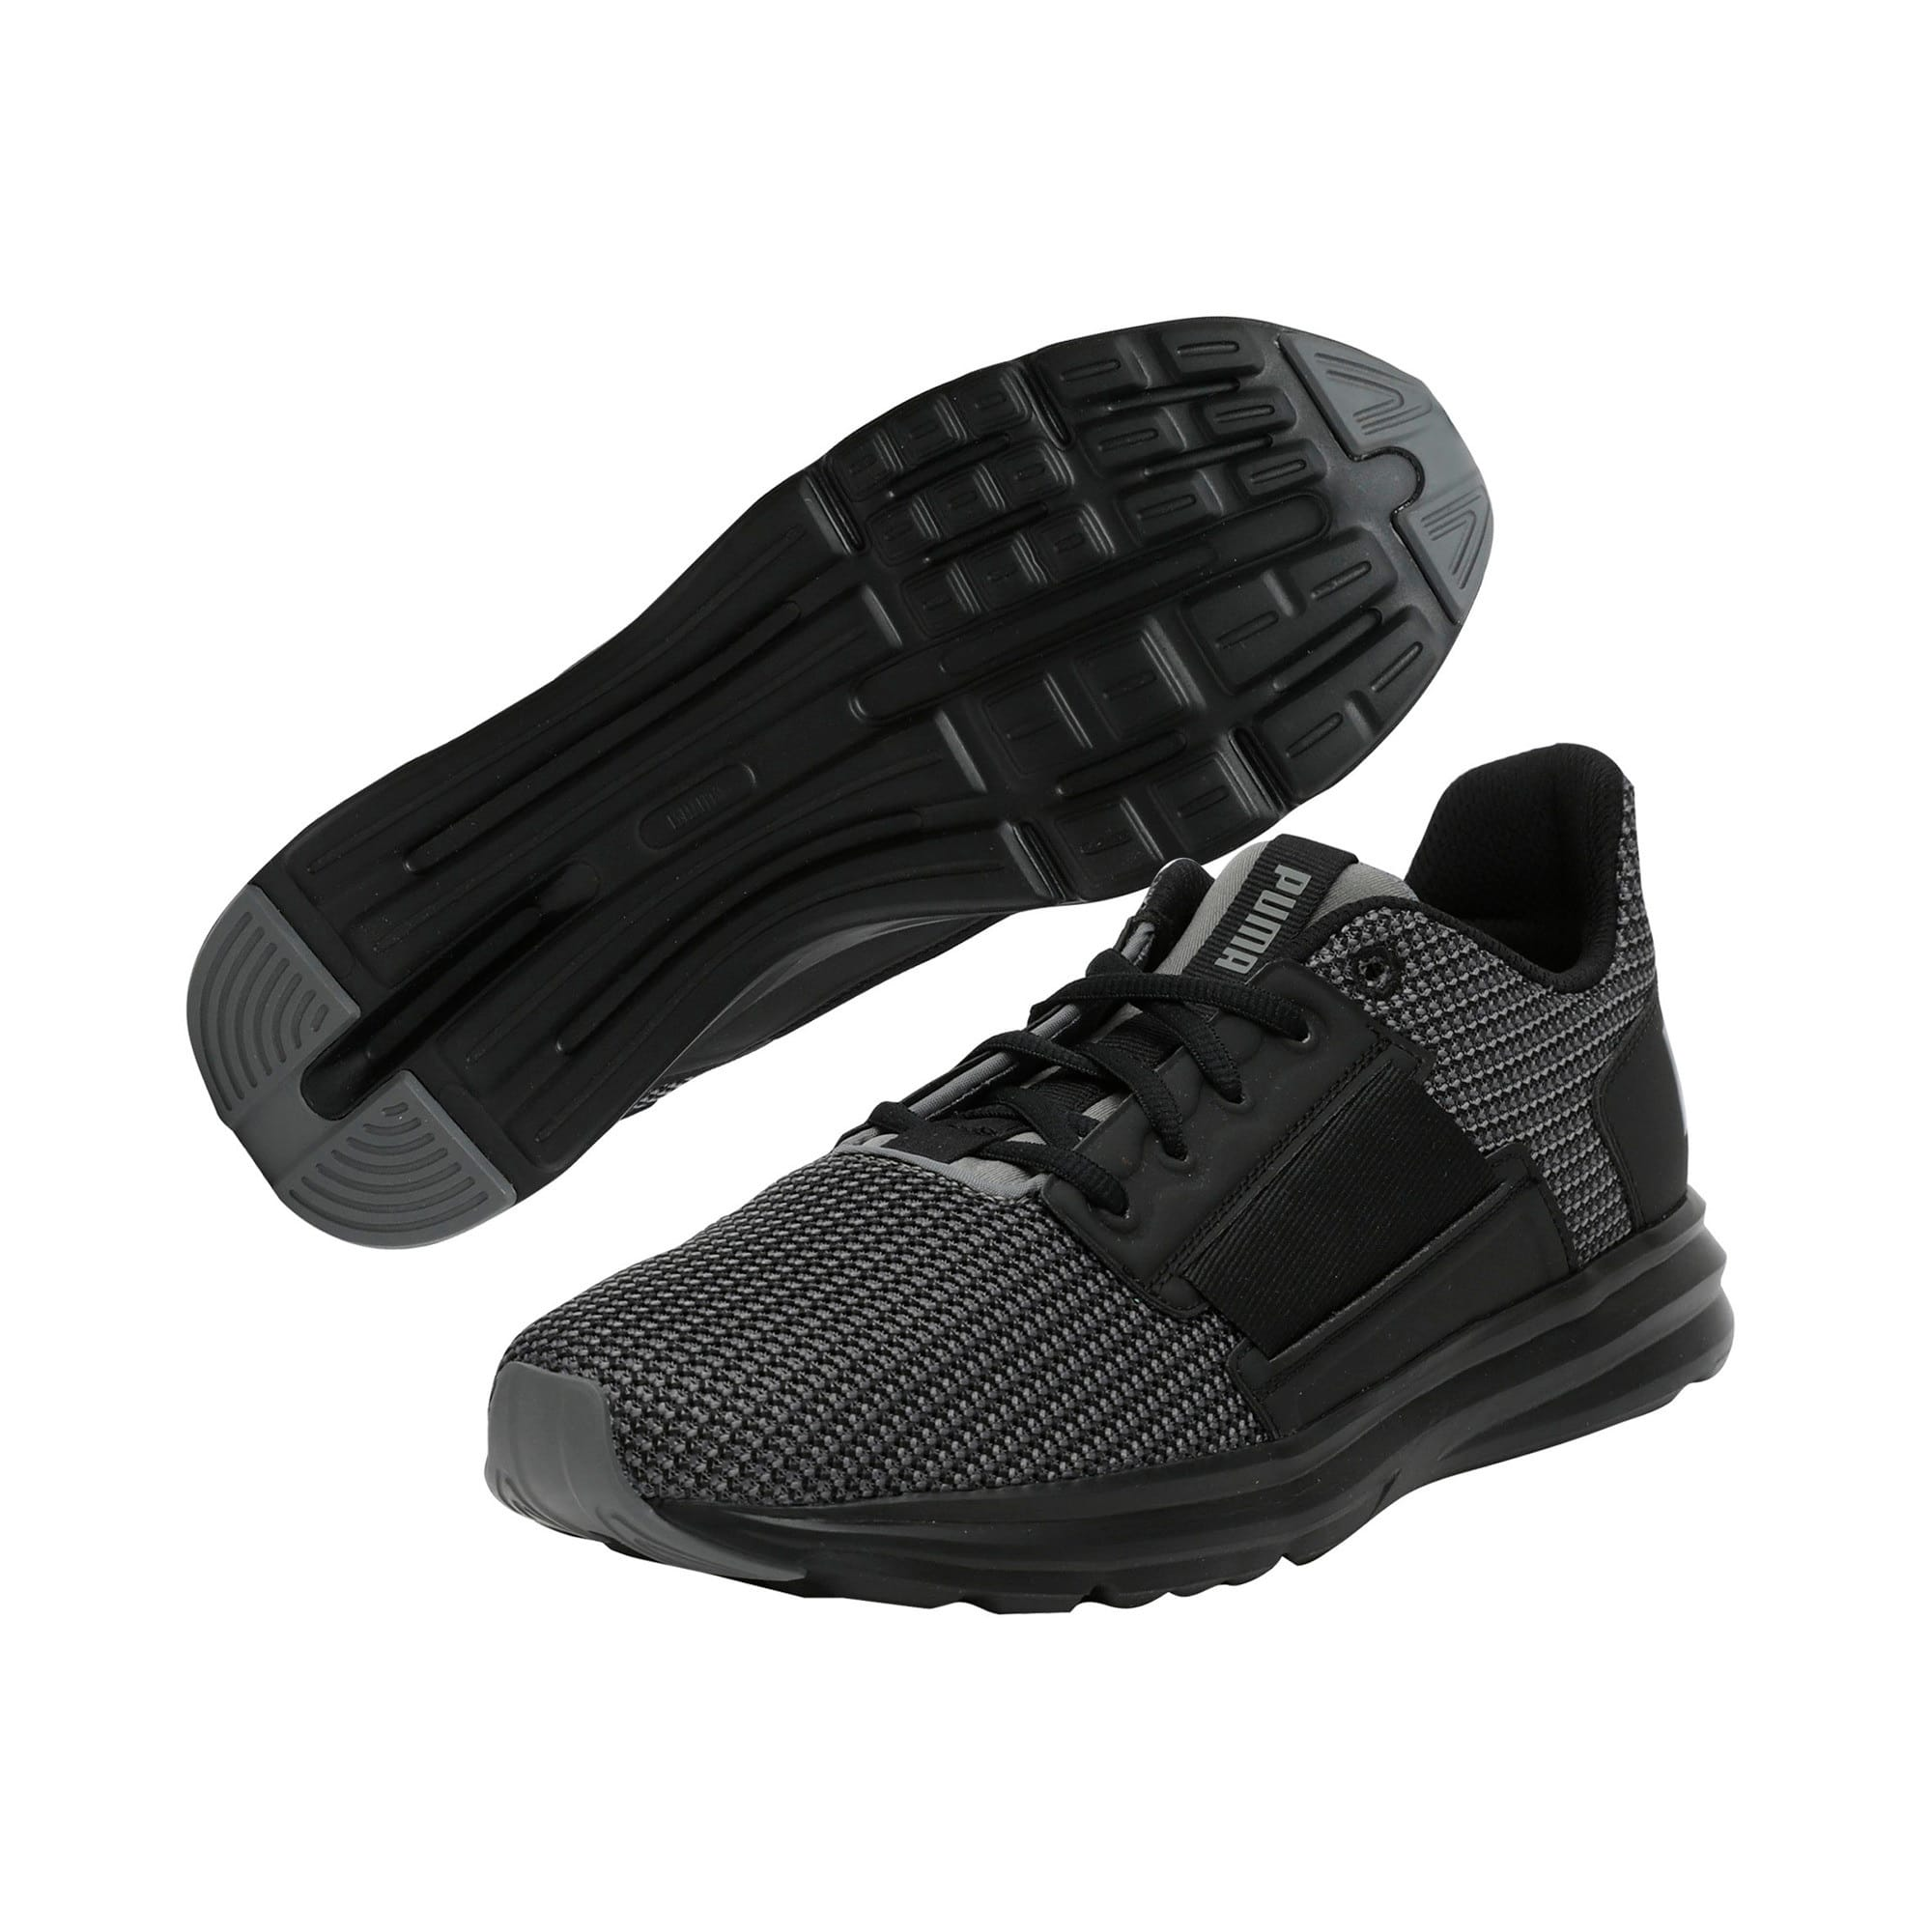 Thumbnail 3 of Enzo Street Knit Men's Running Shoes, QUIET SHADE-Puma Black, medium-IND